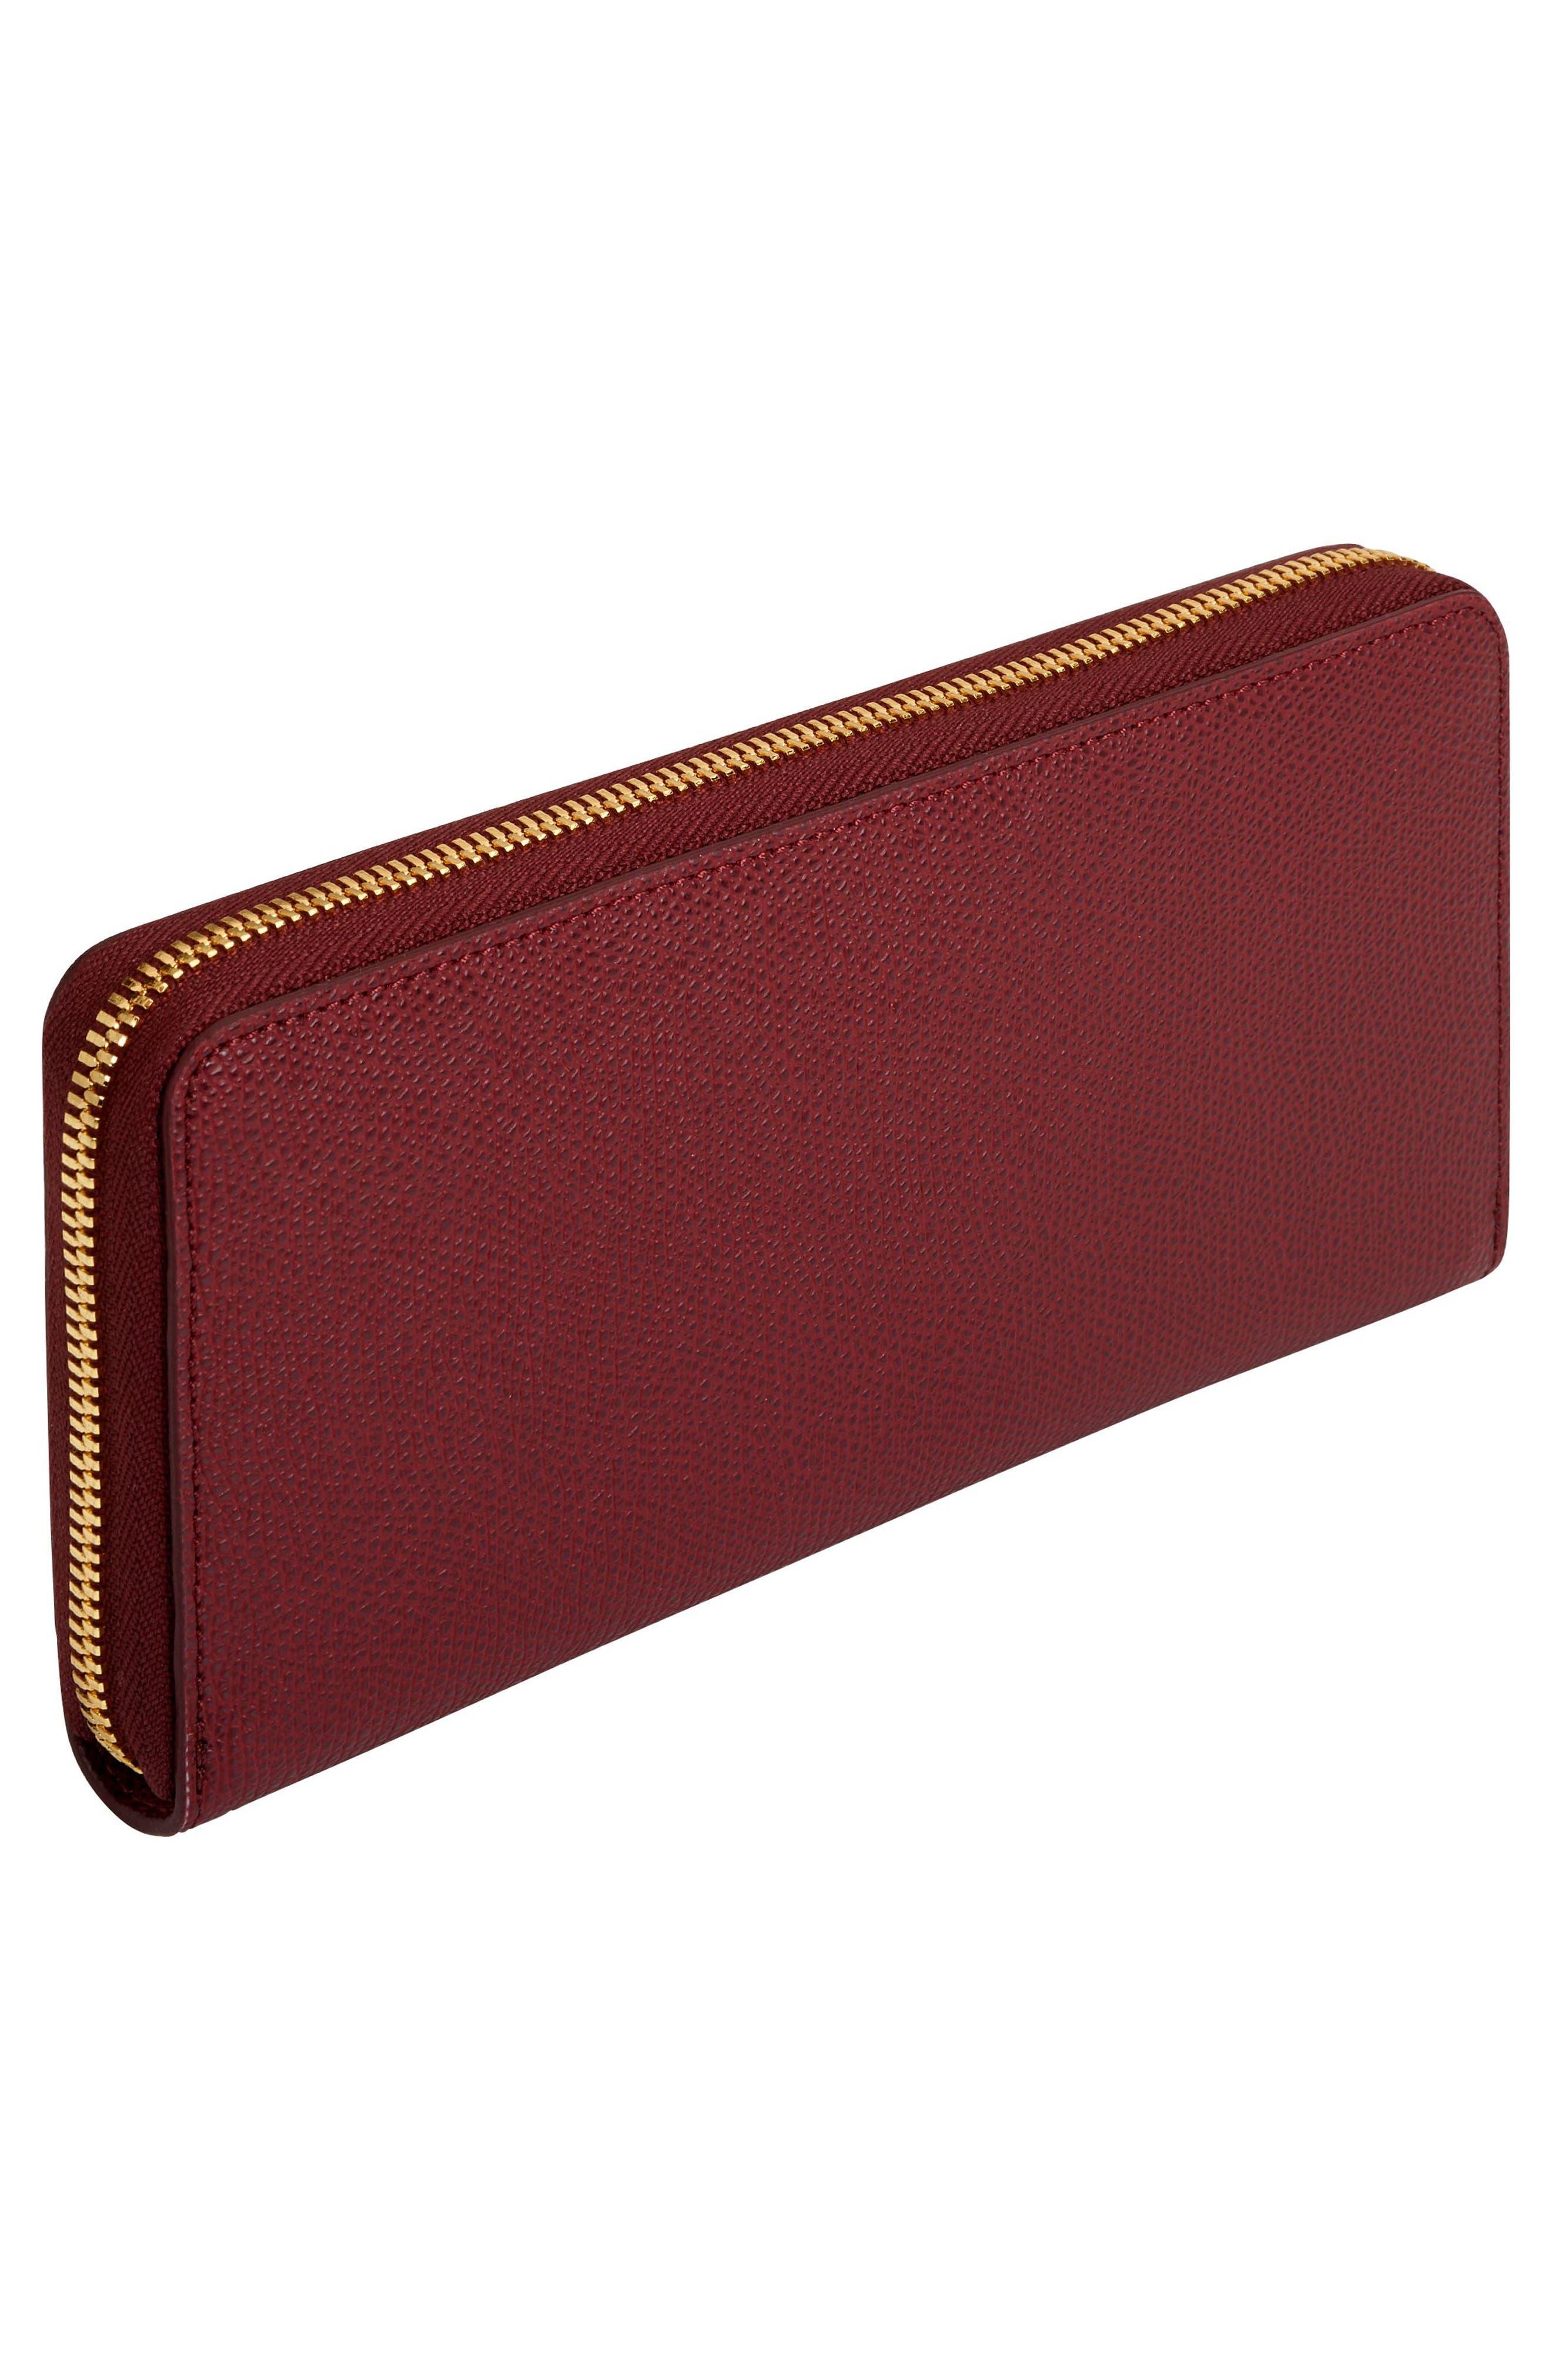 Continental Tech Wallet,                             Alternate thumbnail 3, color,                             Burgundy